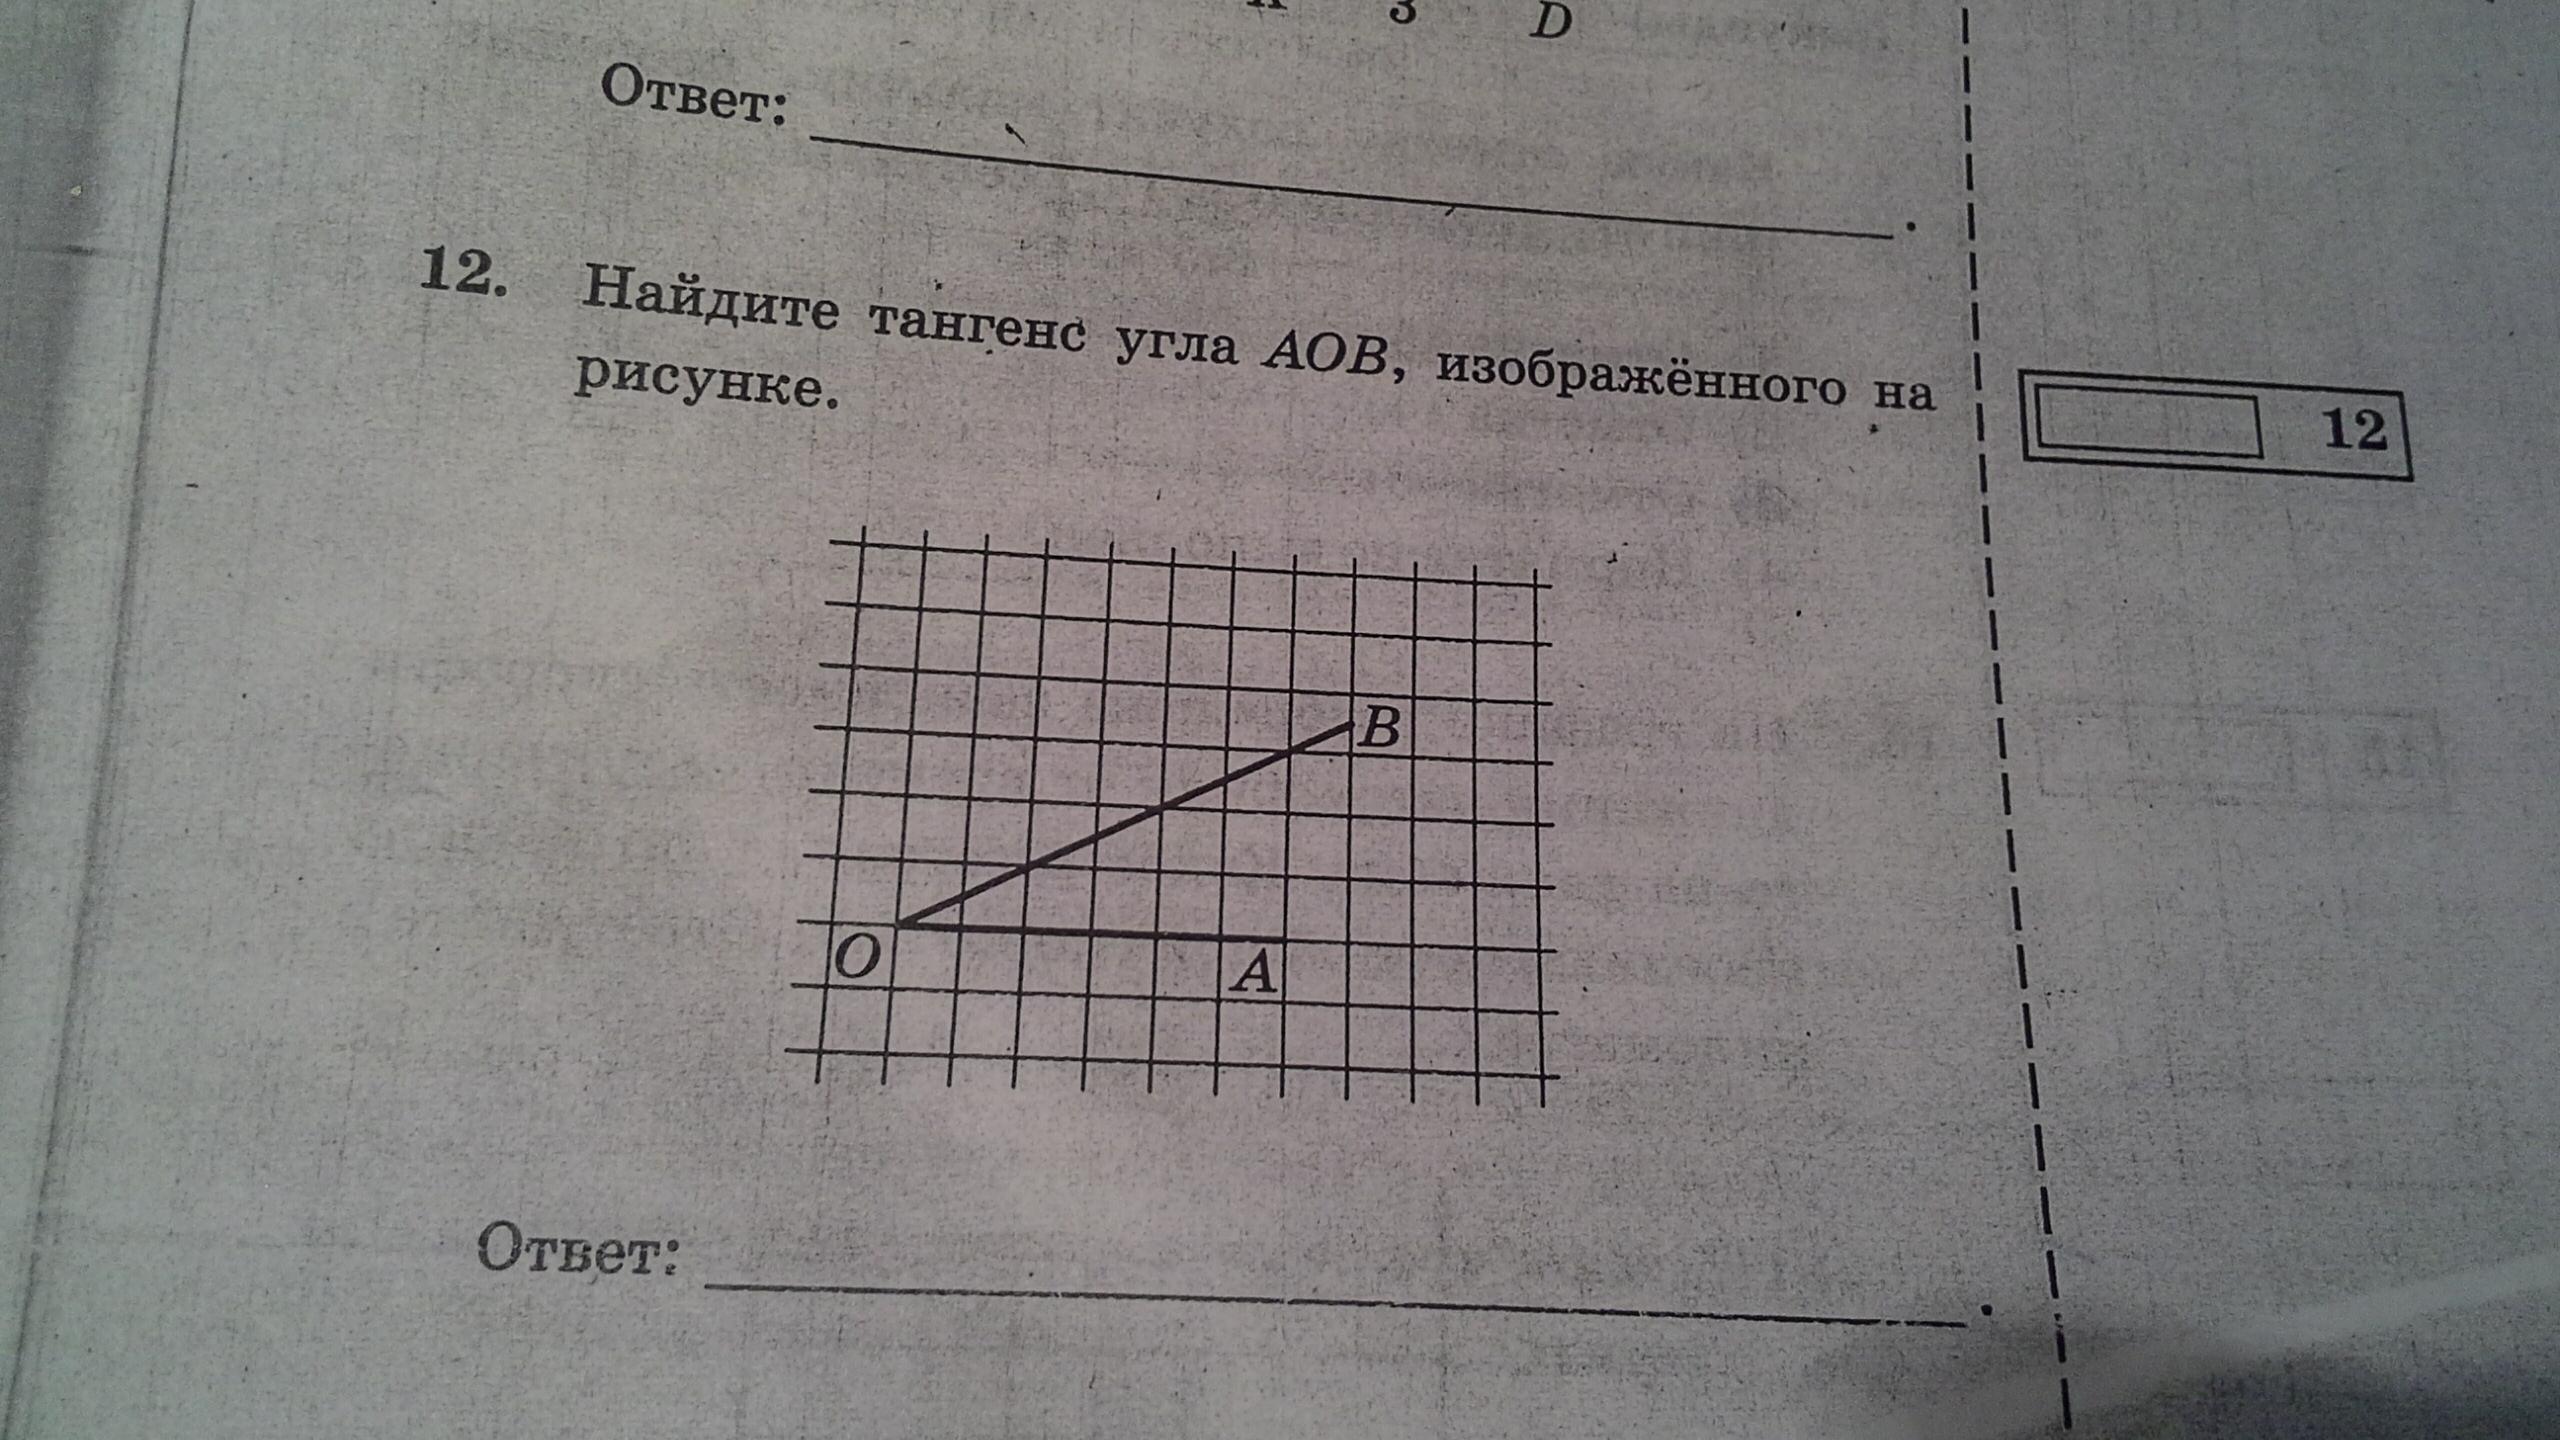 Тангенс угла aob изображенного на рисунке